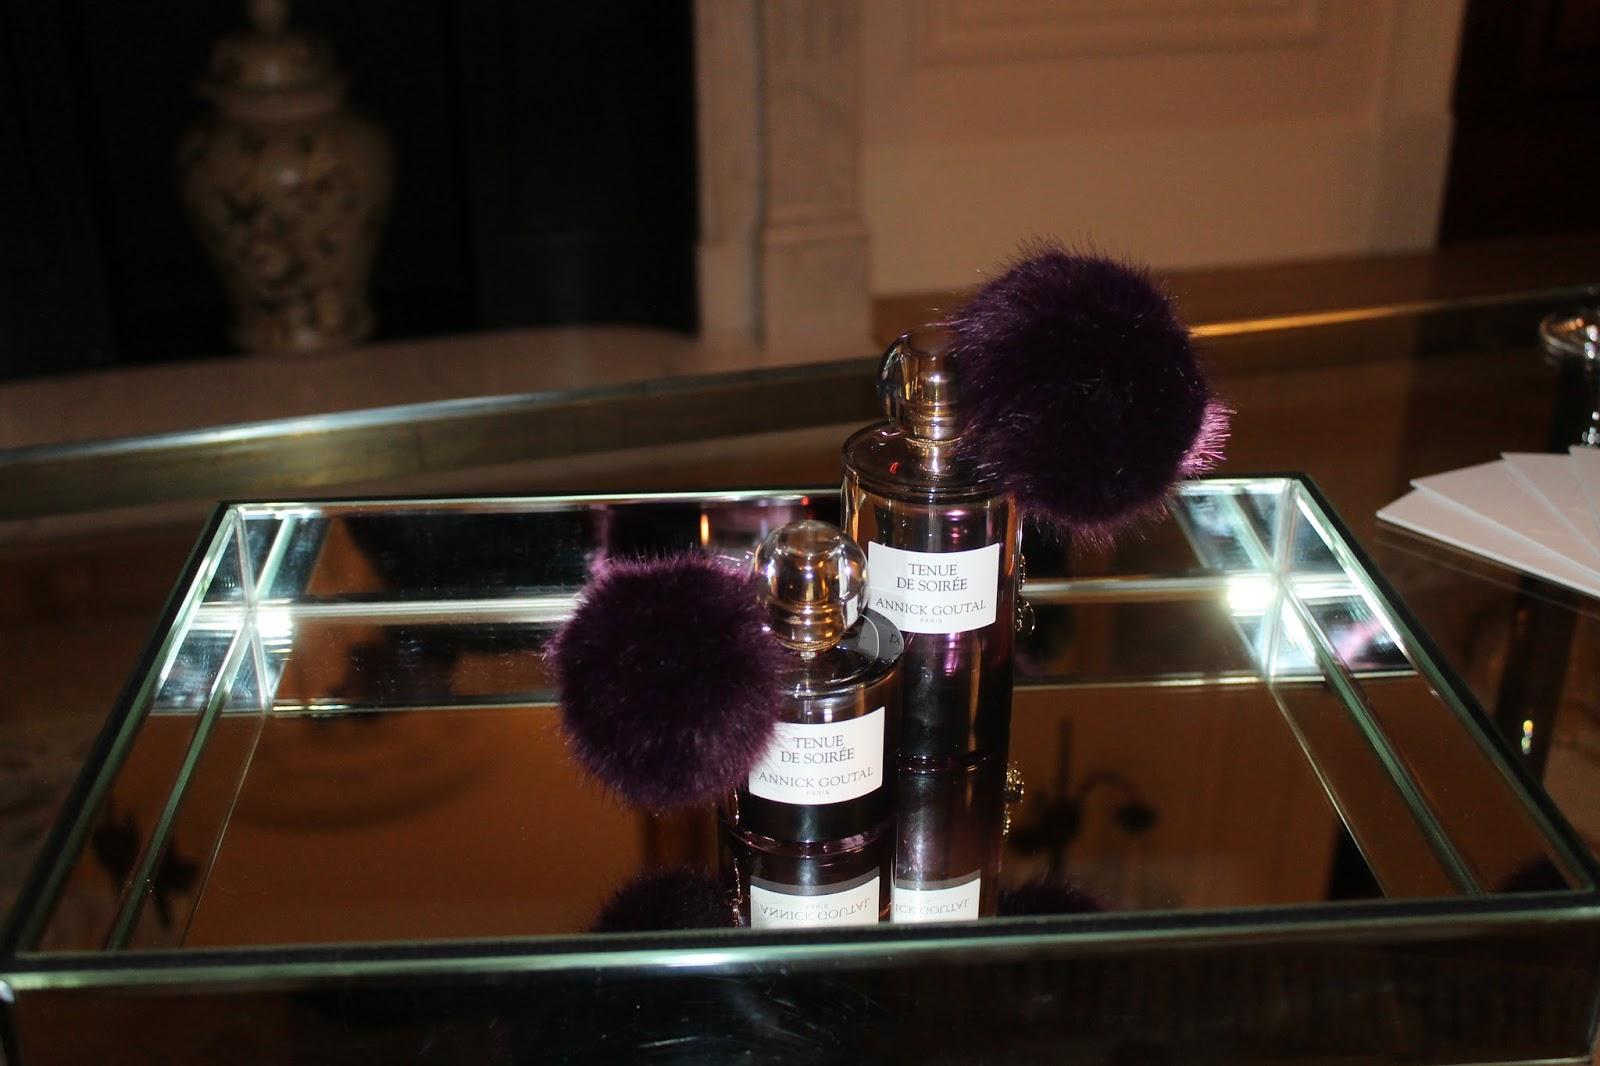 annick goutal new fragrance tenue de soiree. Black Bedroom Furniture Sets. Home Design Ideas